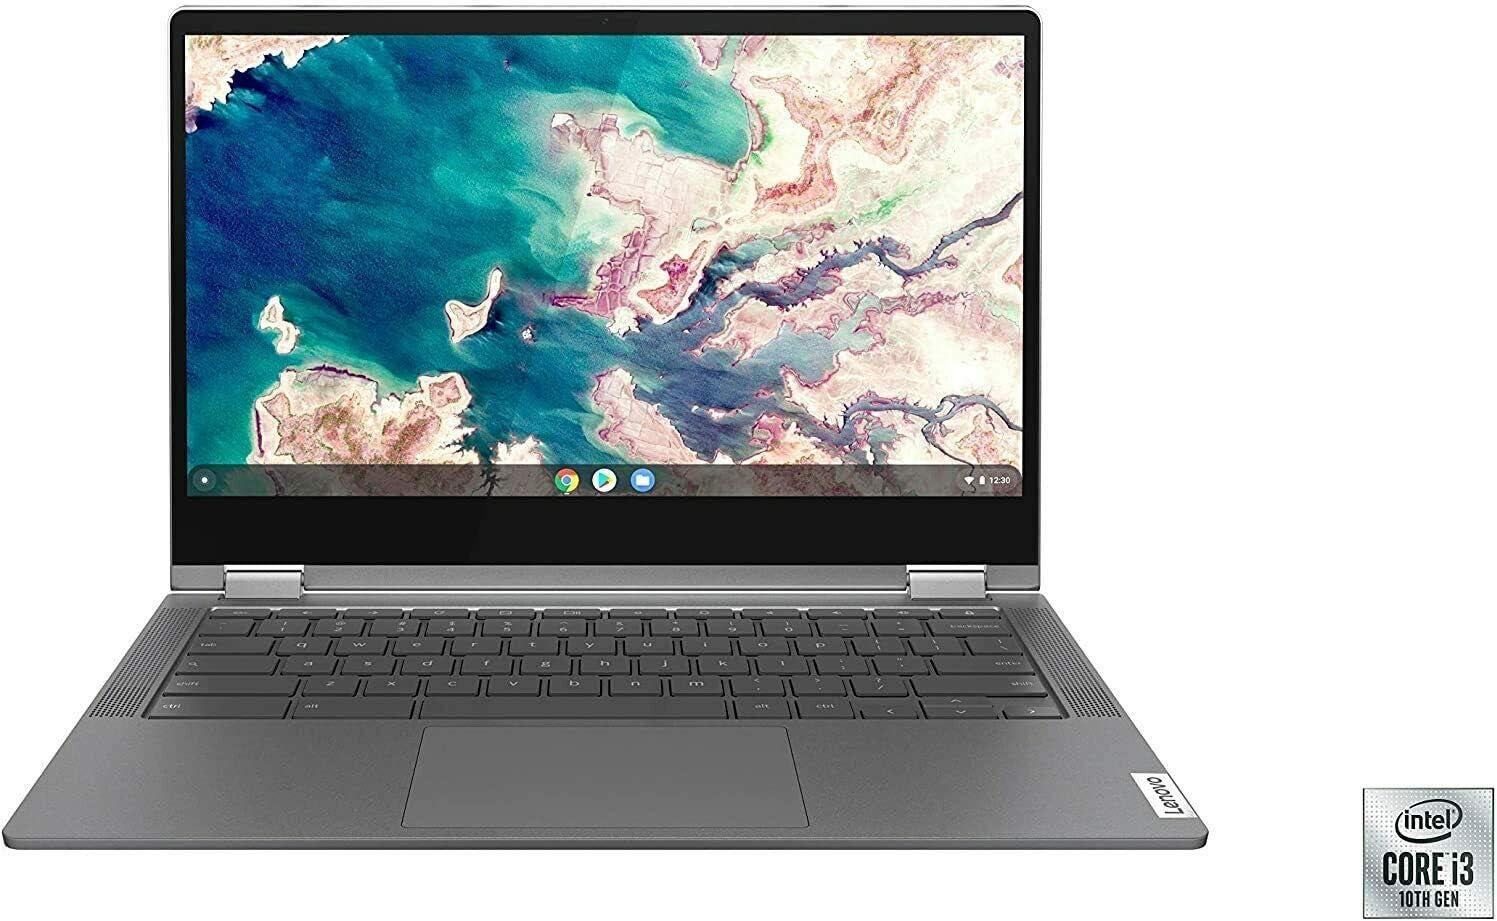 "Lenovo Chromebook Flex 5 13"" FHD IPS Touchscreen 2-in-1 Laptop, Intel Core i3-10110U, 4GB DDR4, 64GB eMMC, MicroSD Card Reader, Webcam, WiFi,BT, Backlit Keyboard, Chrome OS/ GCube 64GB Micro SD Card"